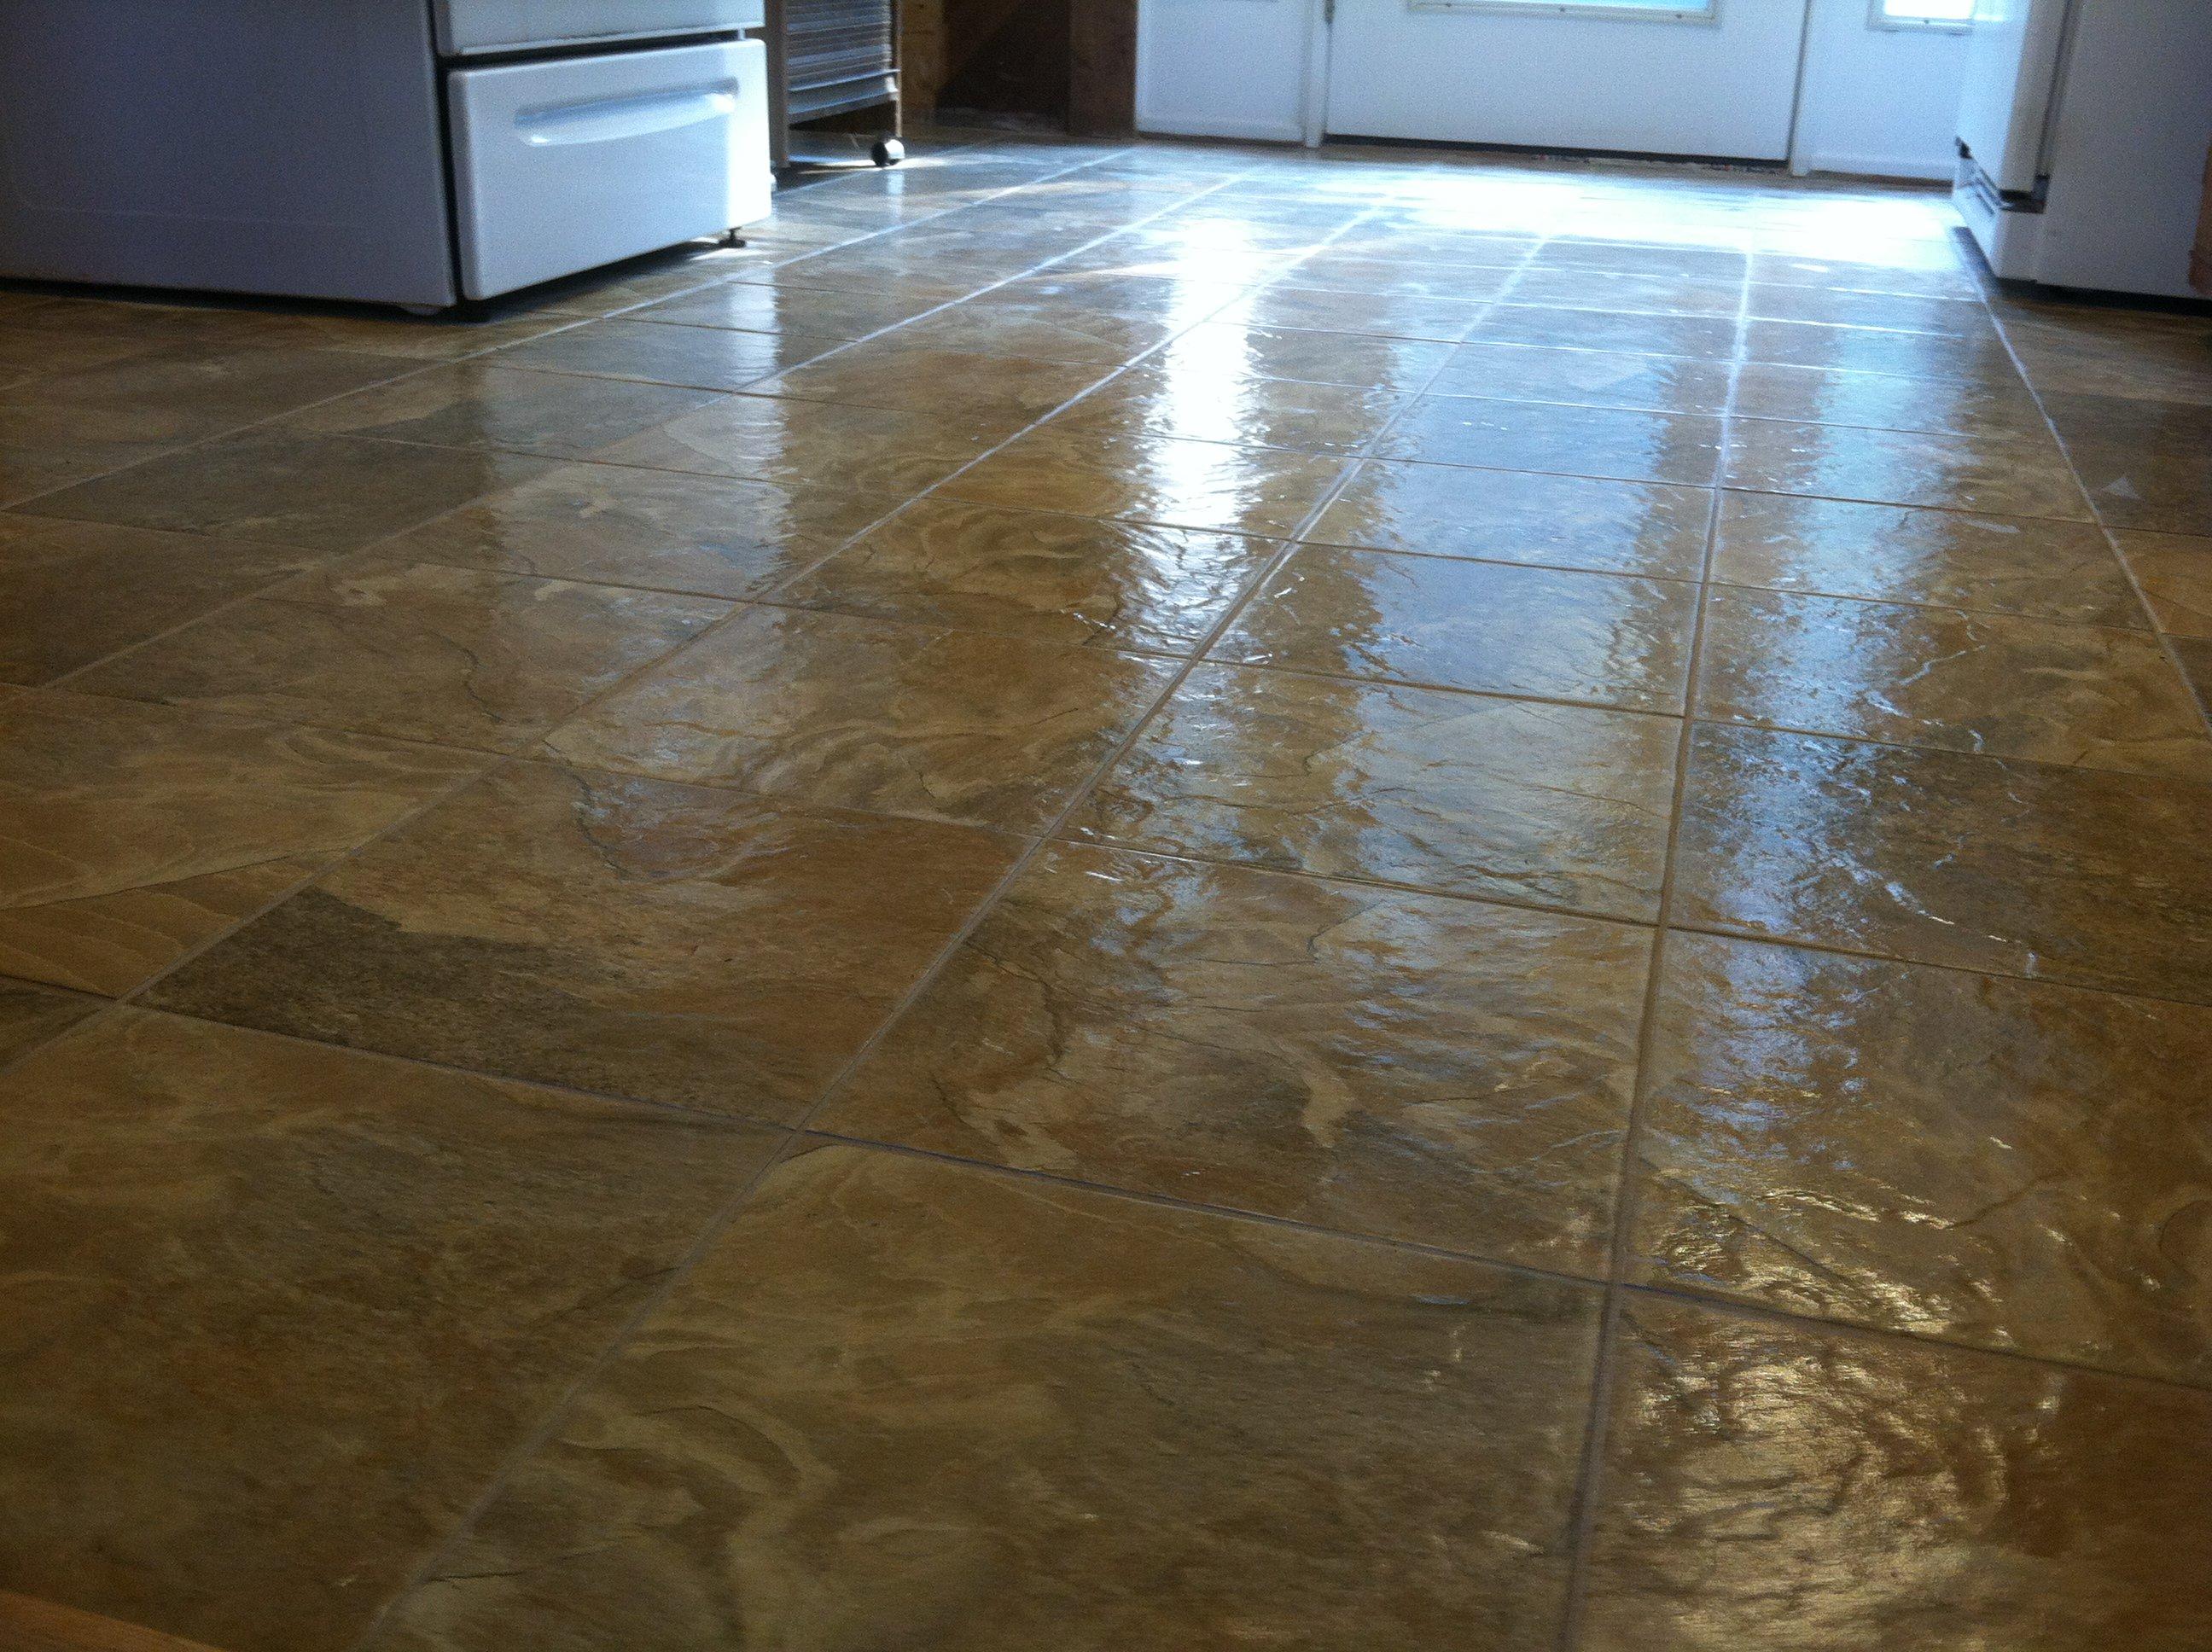 Linoleum floors Advantages and disadvantages of linoleum floors OABAUOR